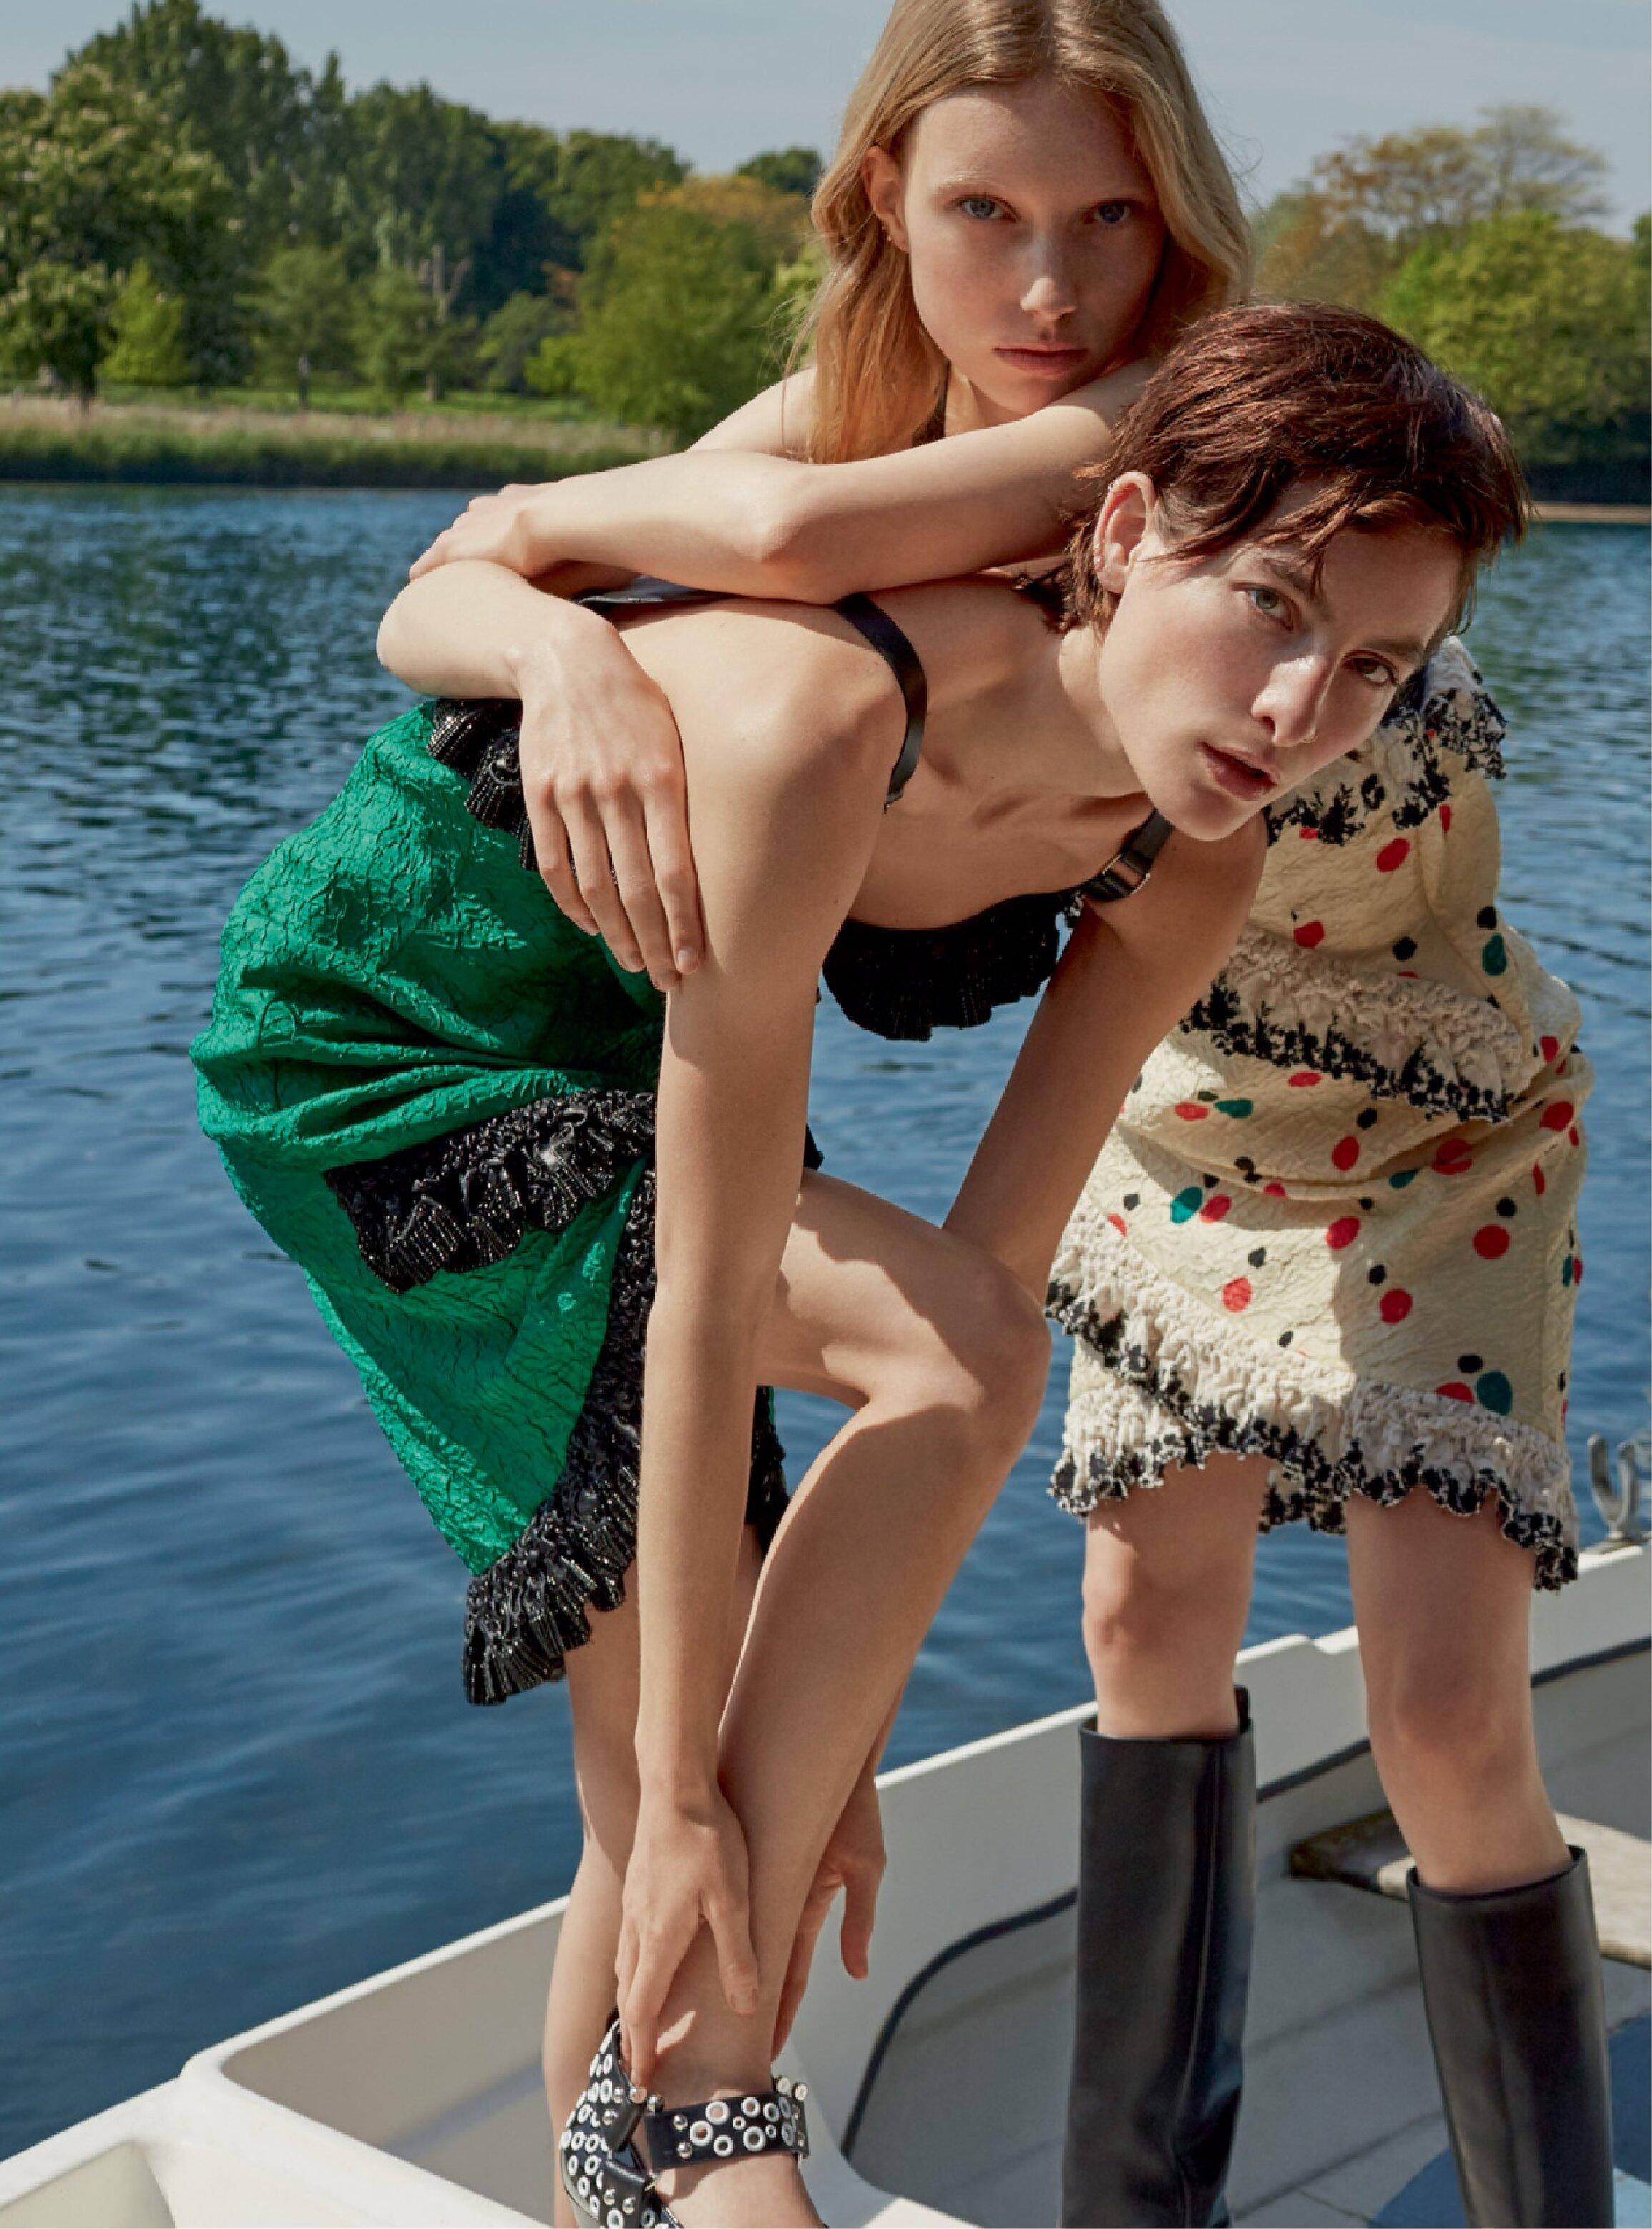 Agata Popieszynska-Girls Are Back in Town Harper's Bazaar UK Aug 2019 (13).jpg